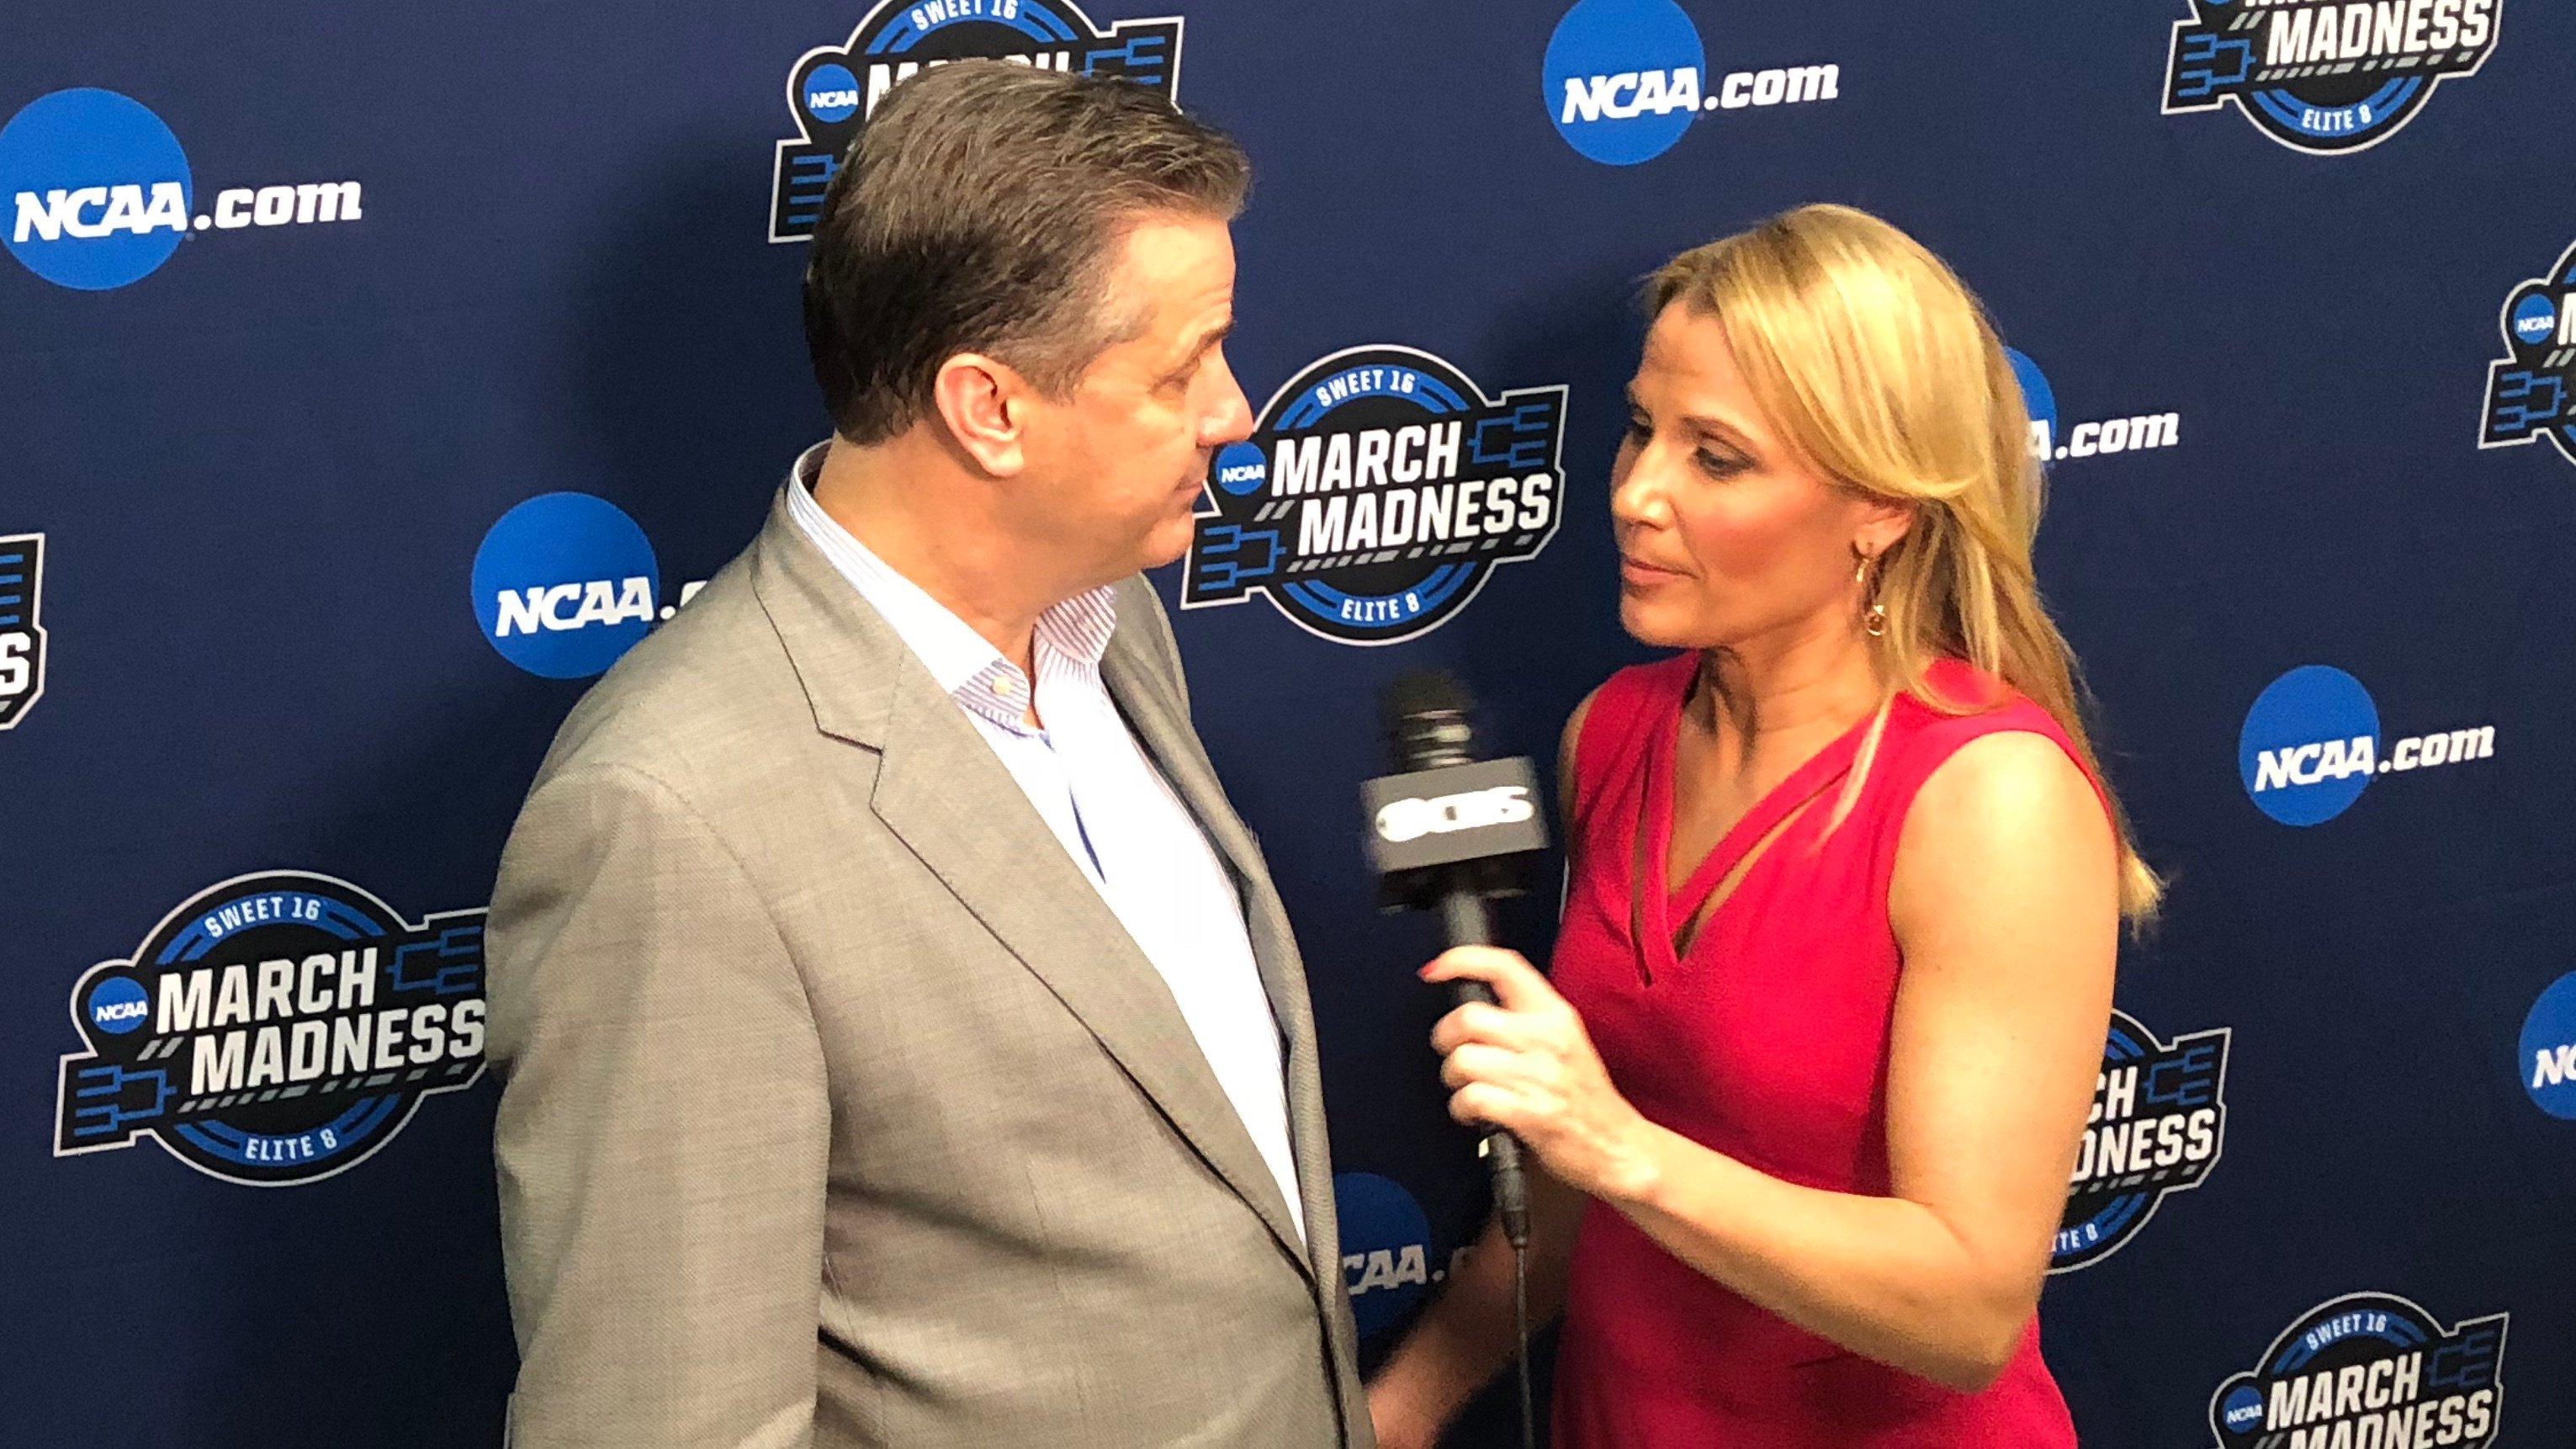 John Calipari says 'no disrespect' after Kentucky skipped handshakes with Kansas State